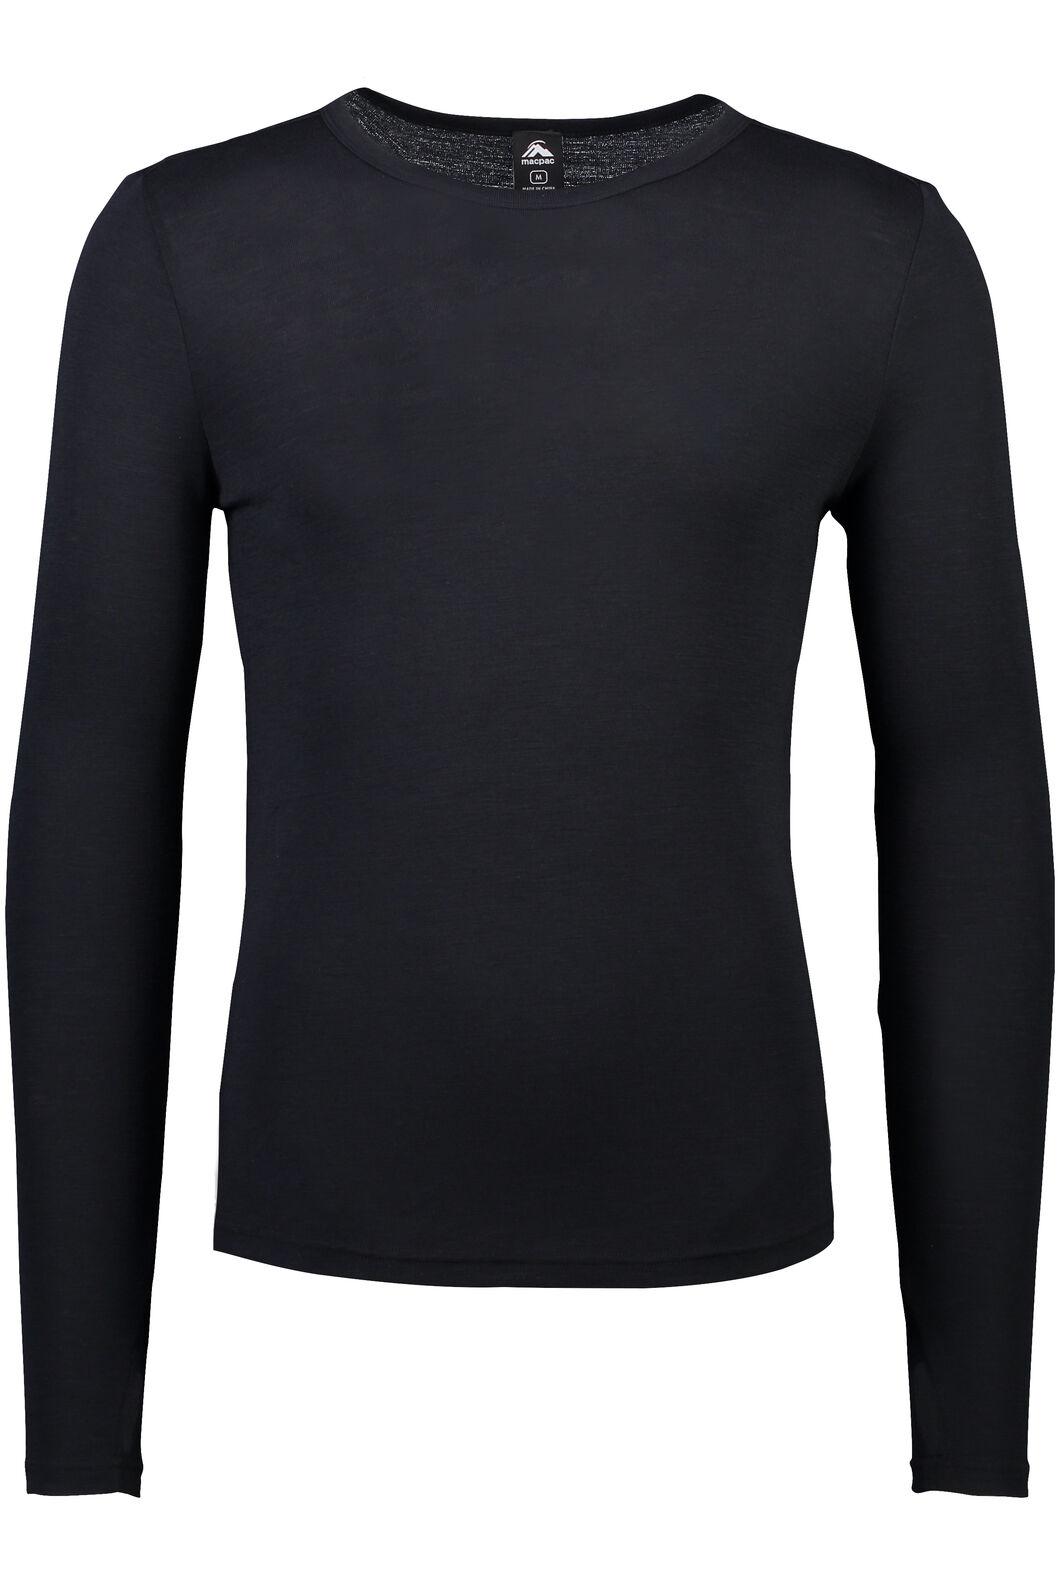 Macpac 220 Merino Long Sleeve Top - Men's, Black, hi-res